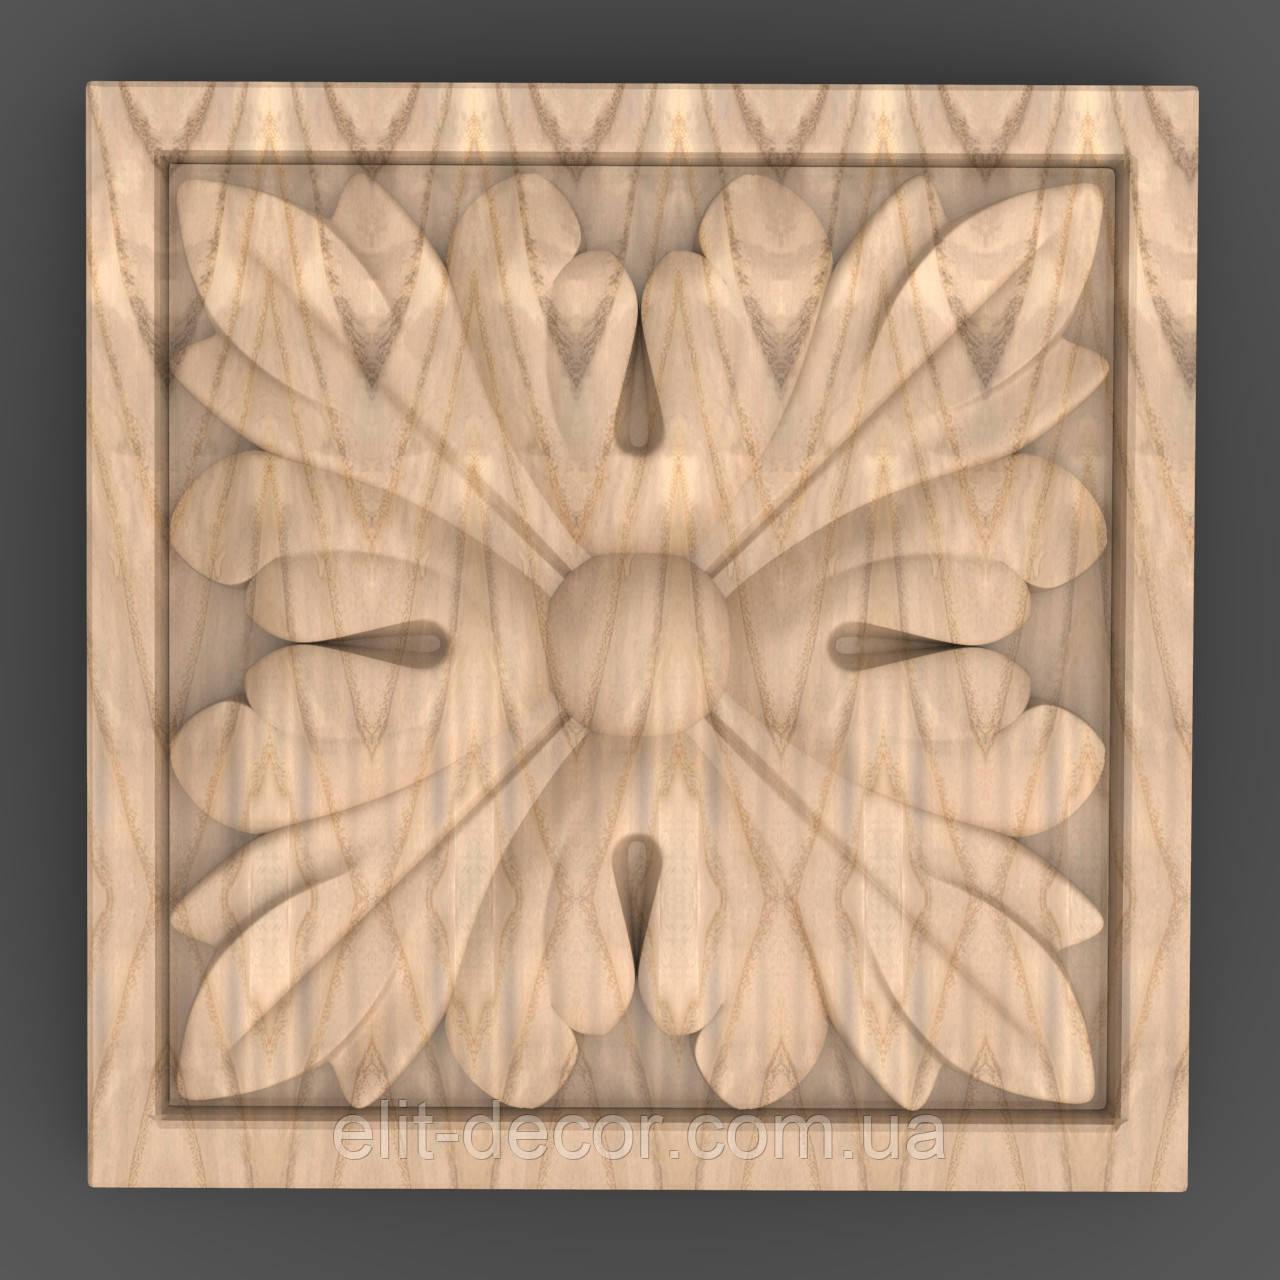 Резная квадратная розетка 60x60x8. RK-020